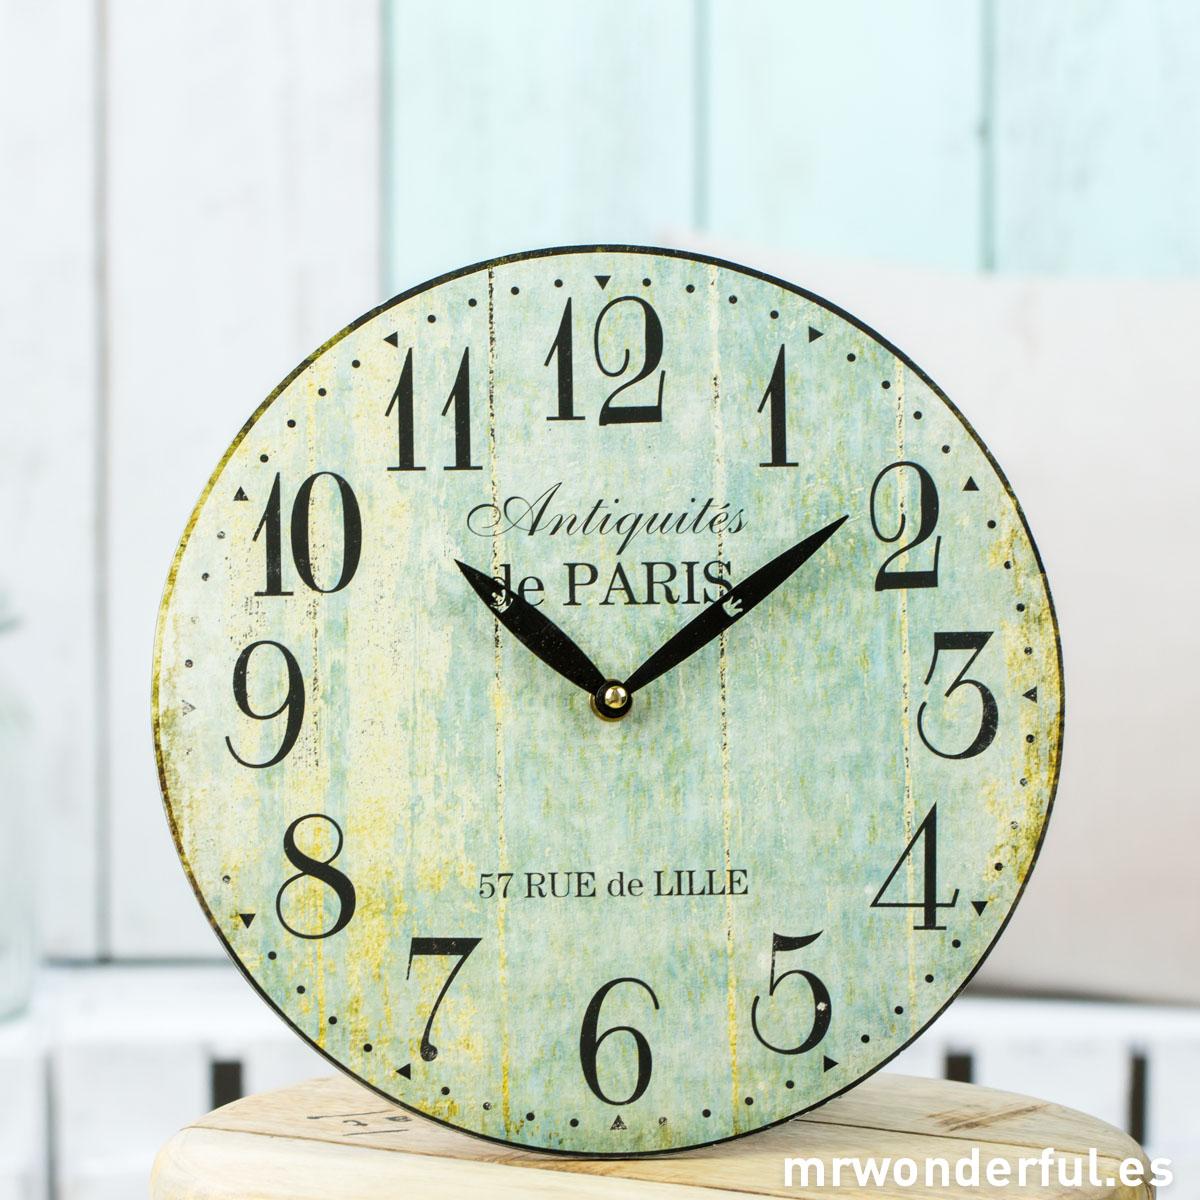 Mrwonderful_CL1097_2_Reloj-pared-efecto-madera-desgastada-verde-1